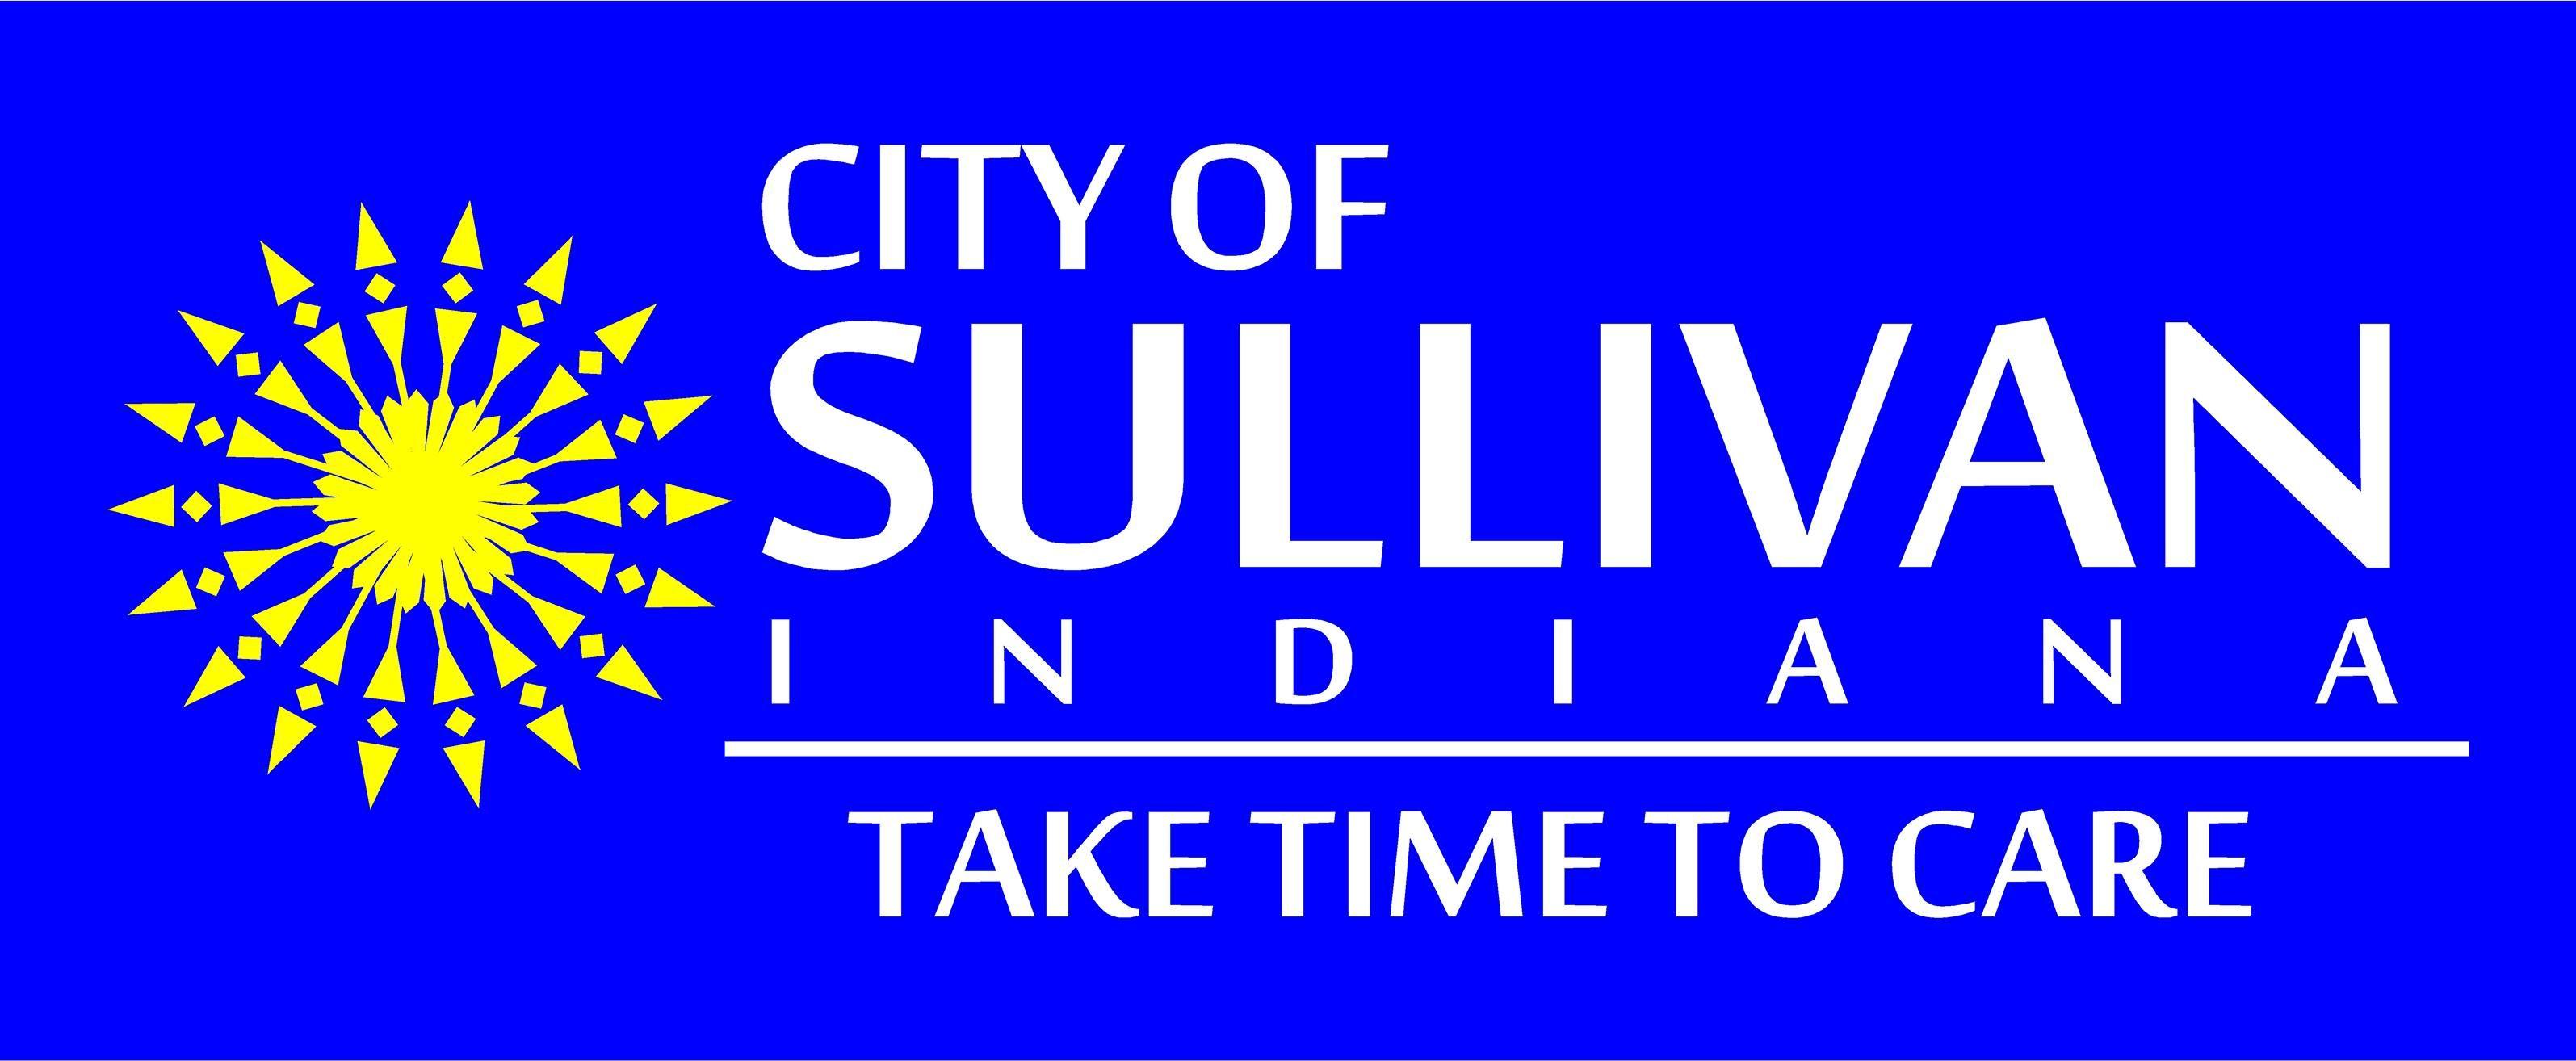 City of Sullivan